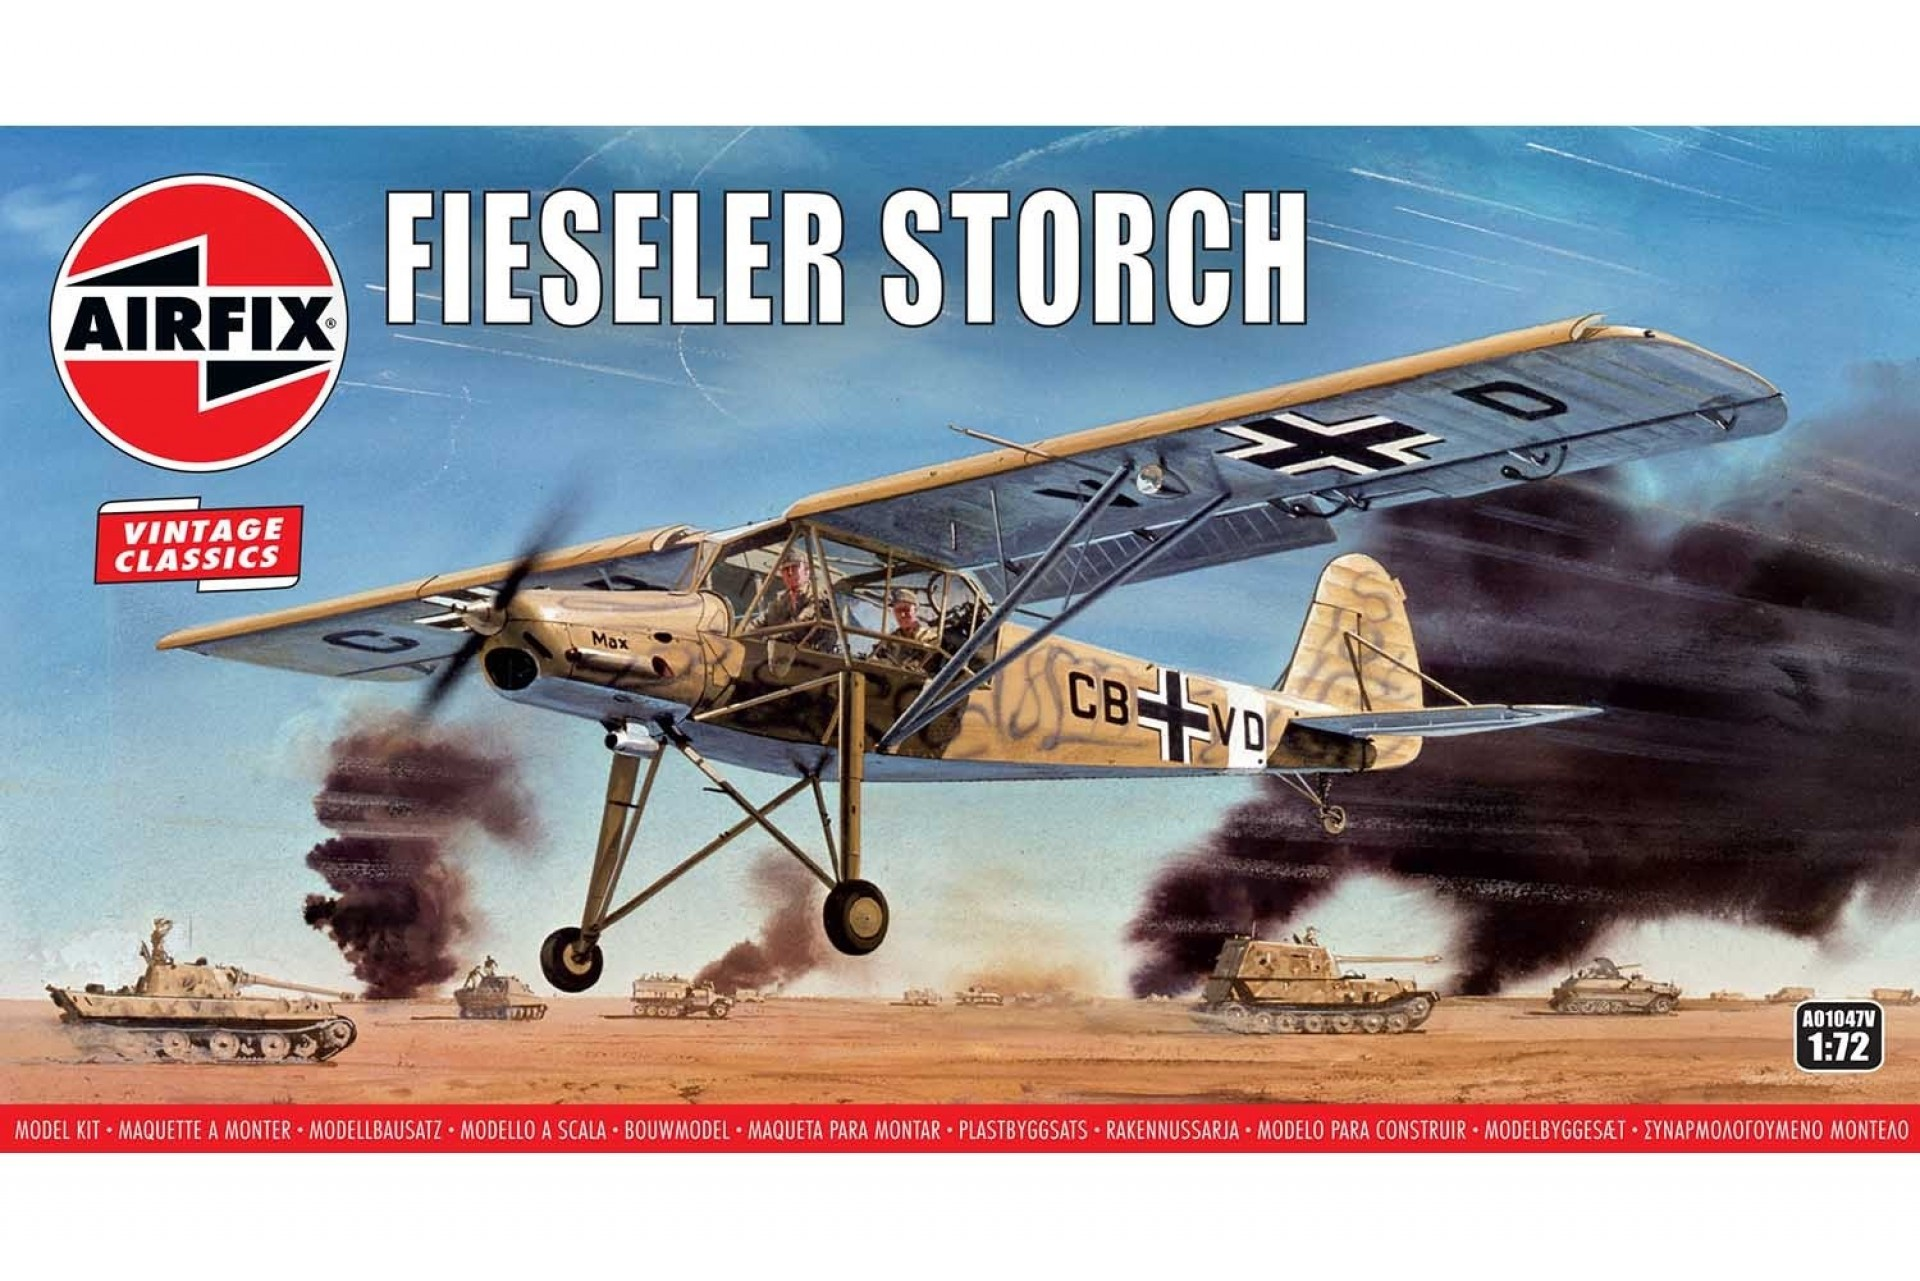 Fiesler Storch 1:72 Airfix Model